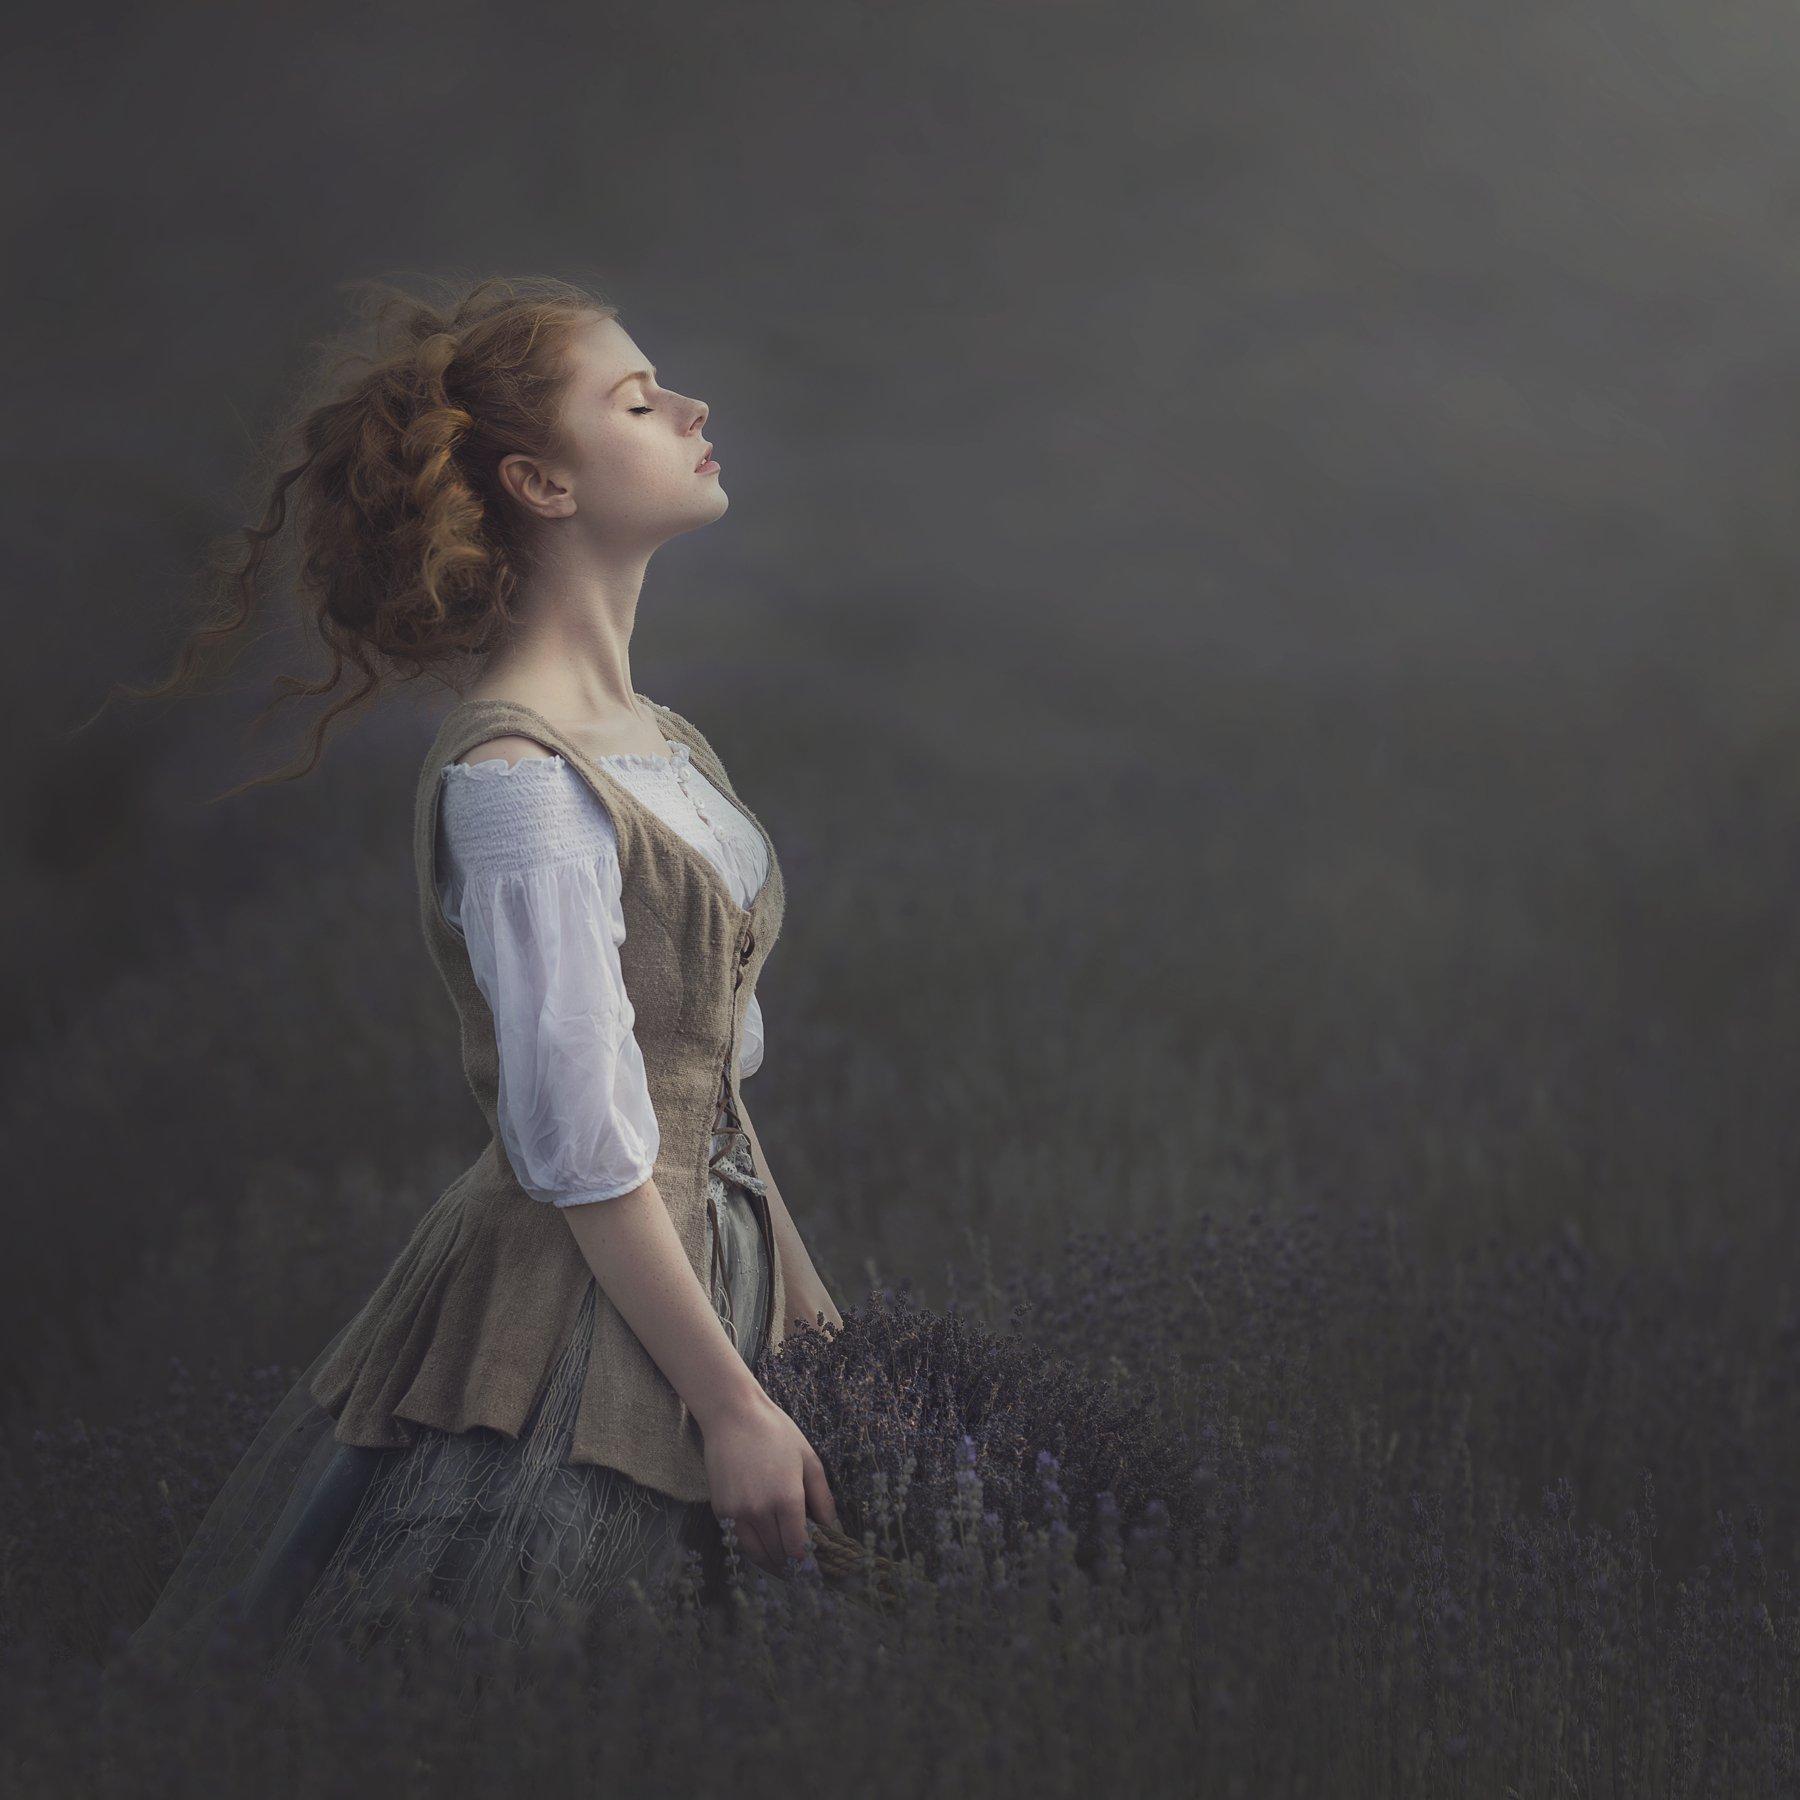 #vintage #lavenda #storytelling #portrait #dreamcatcher , Izabella Sapuła